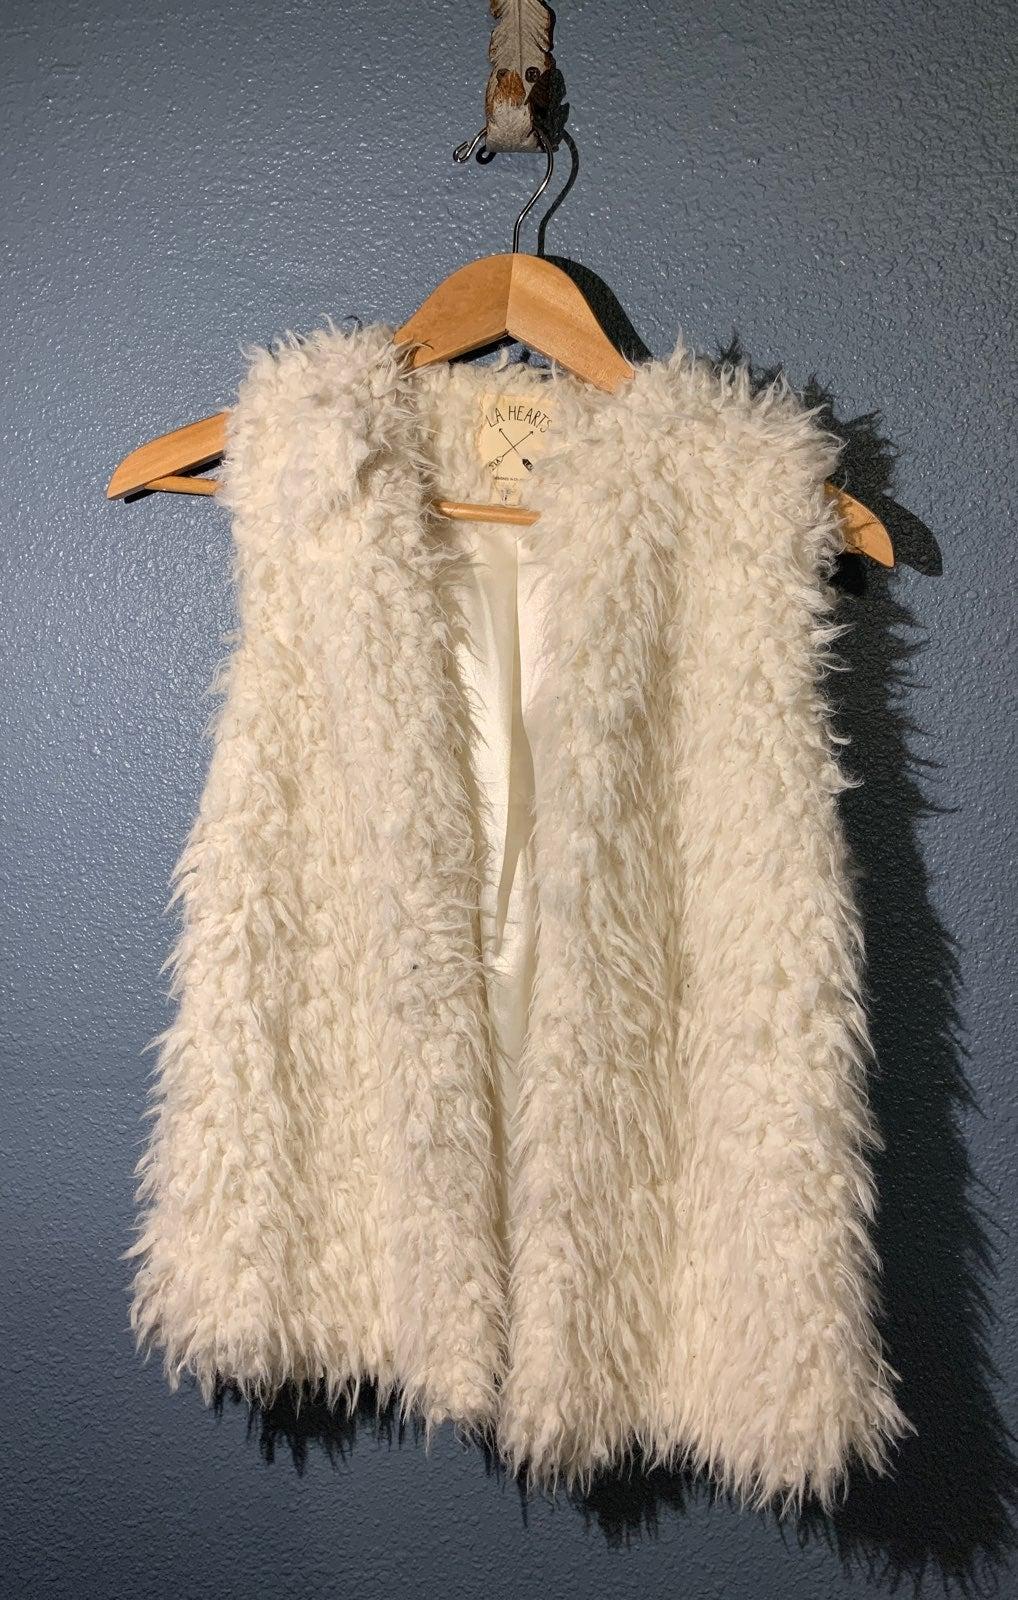 Faux Fur vest Cream La Hearts PacSun